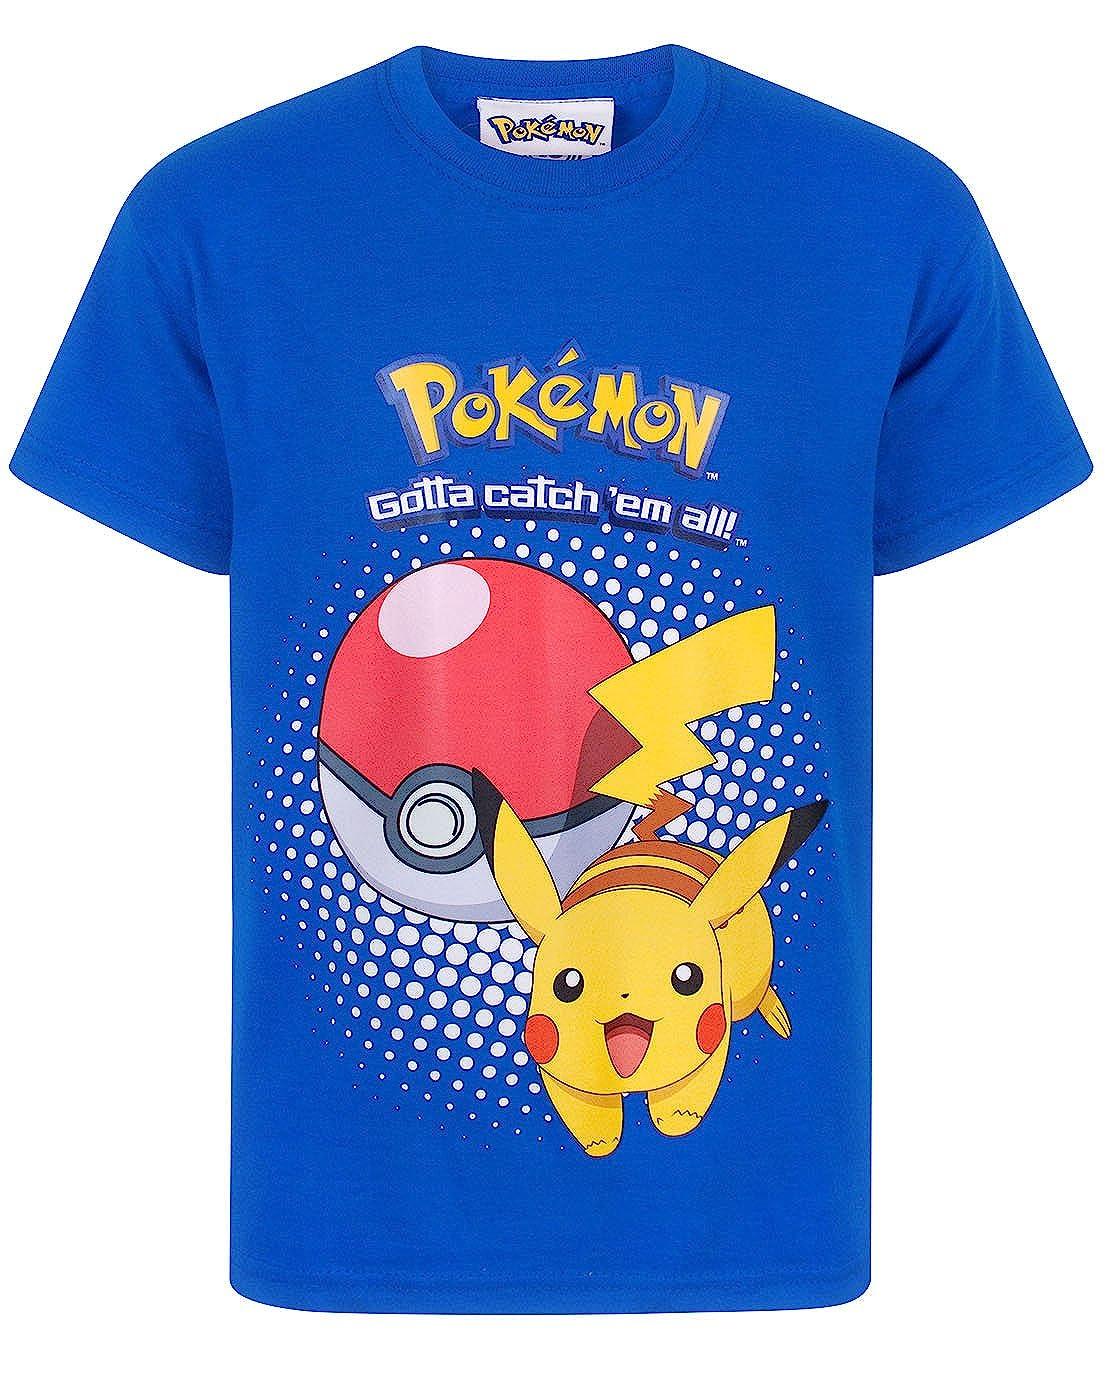 Official Pokemon Pikachu Kid's T-Shirt